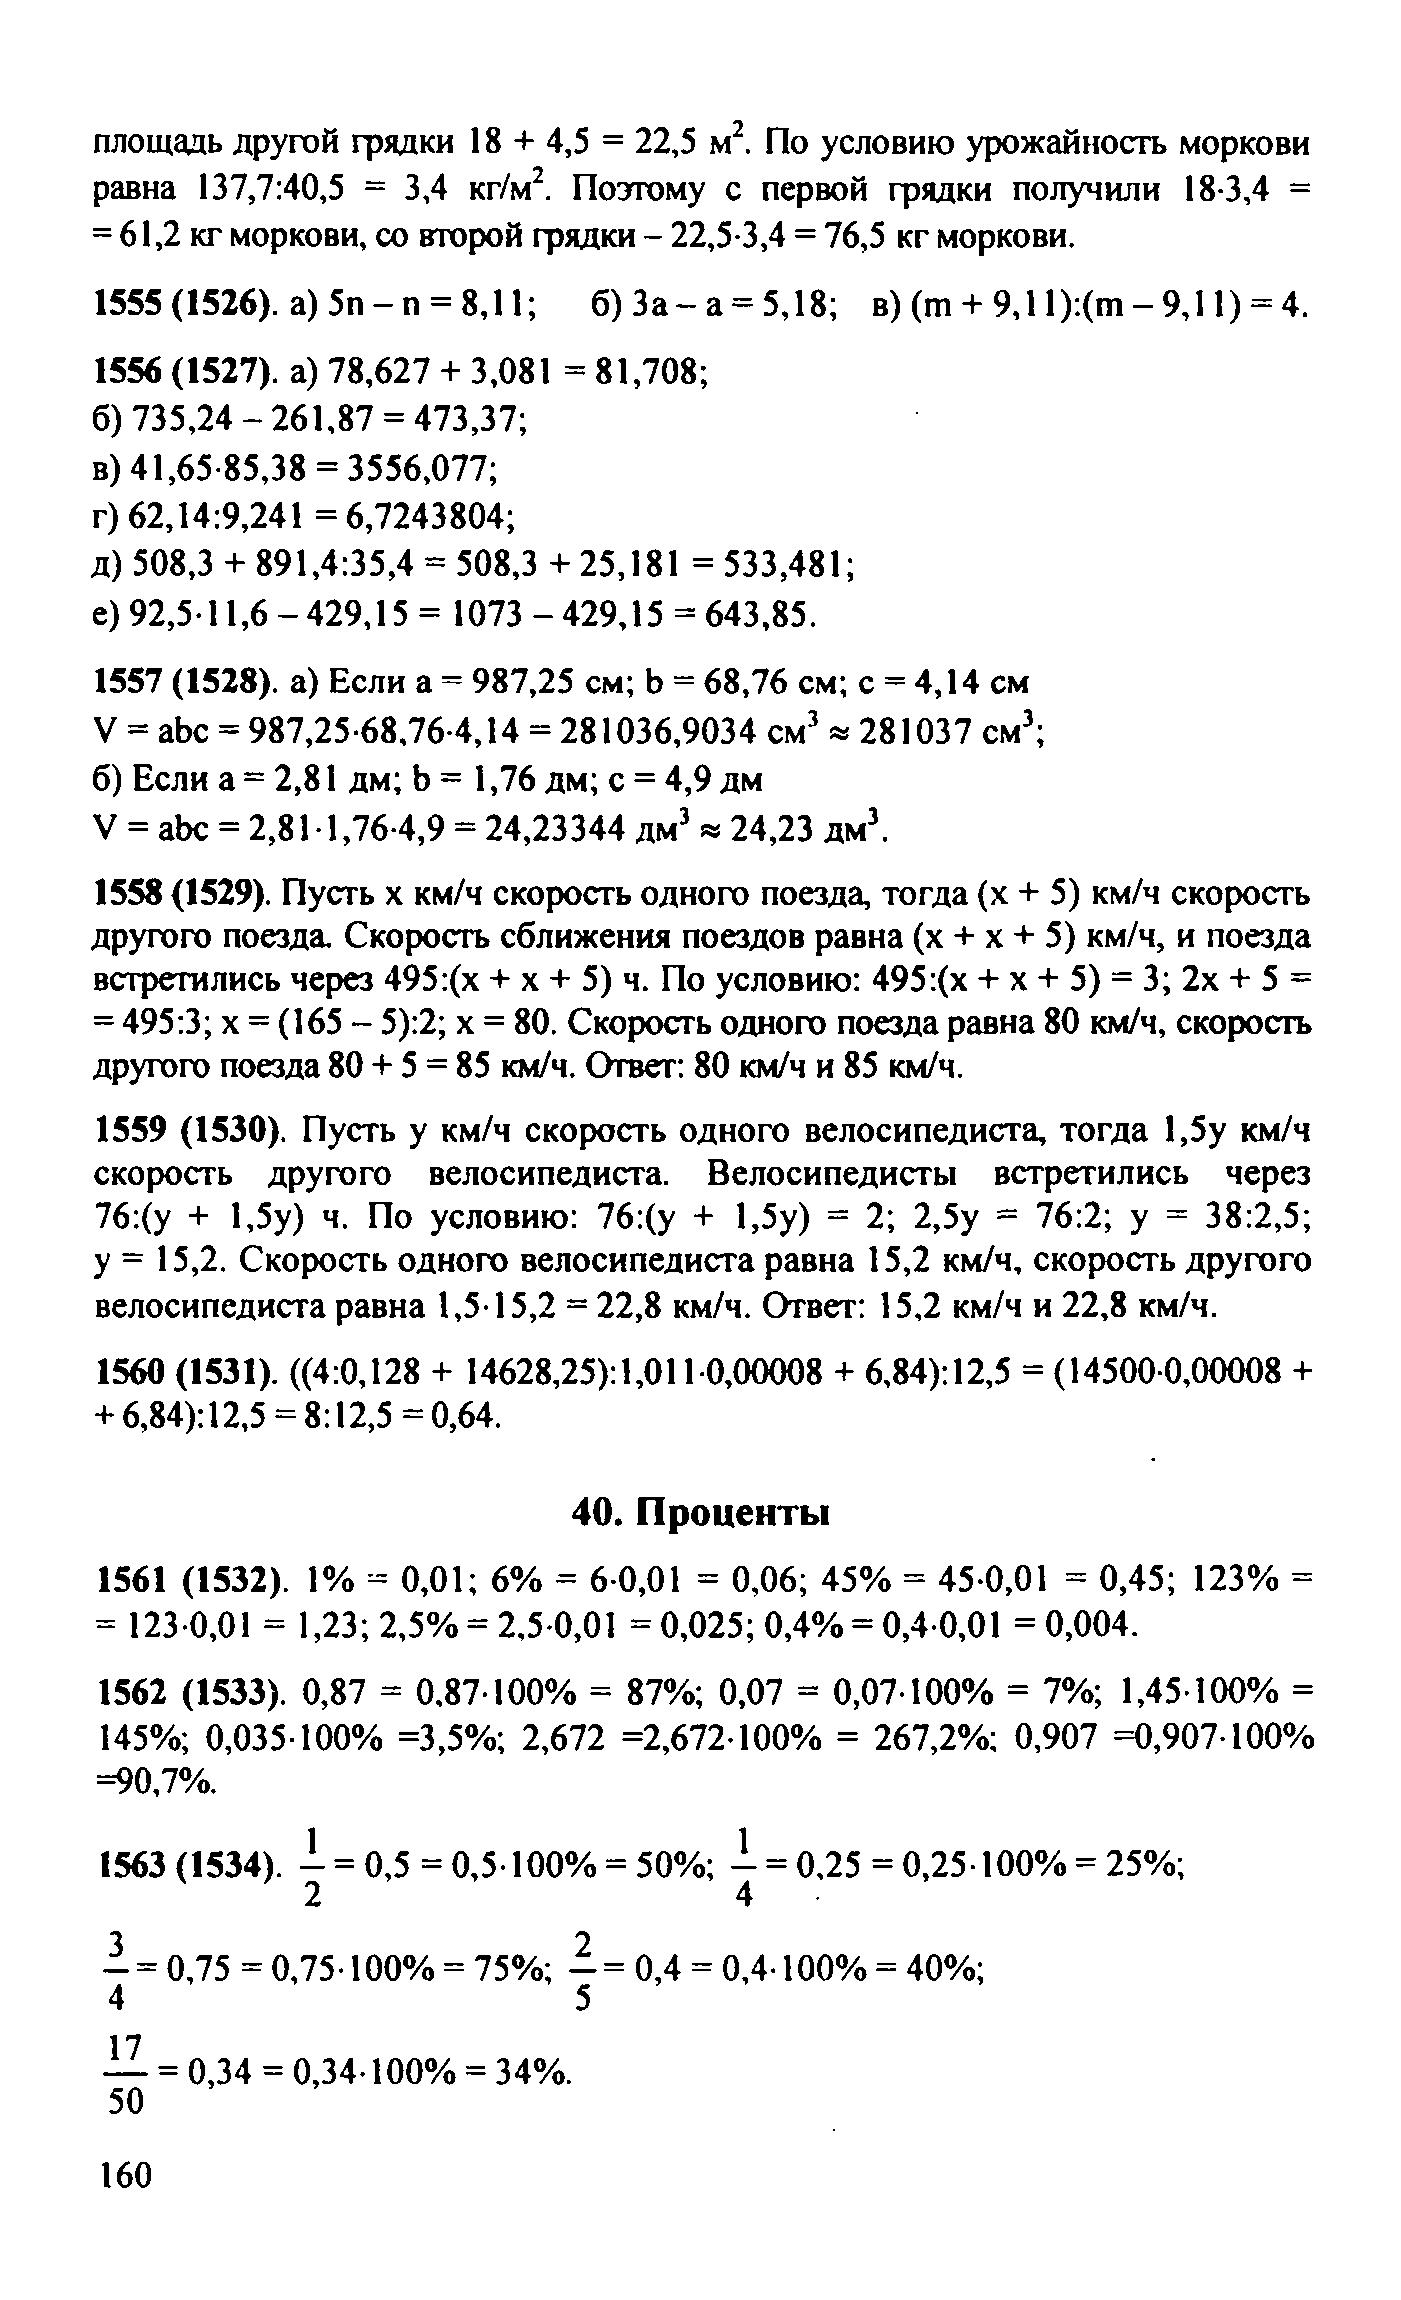 гдз виленкин 5 класс 1534